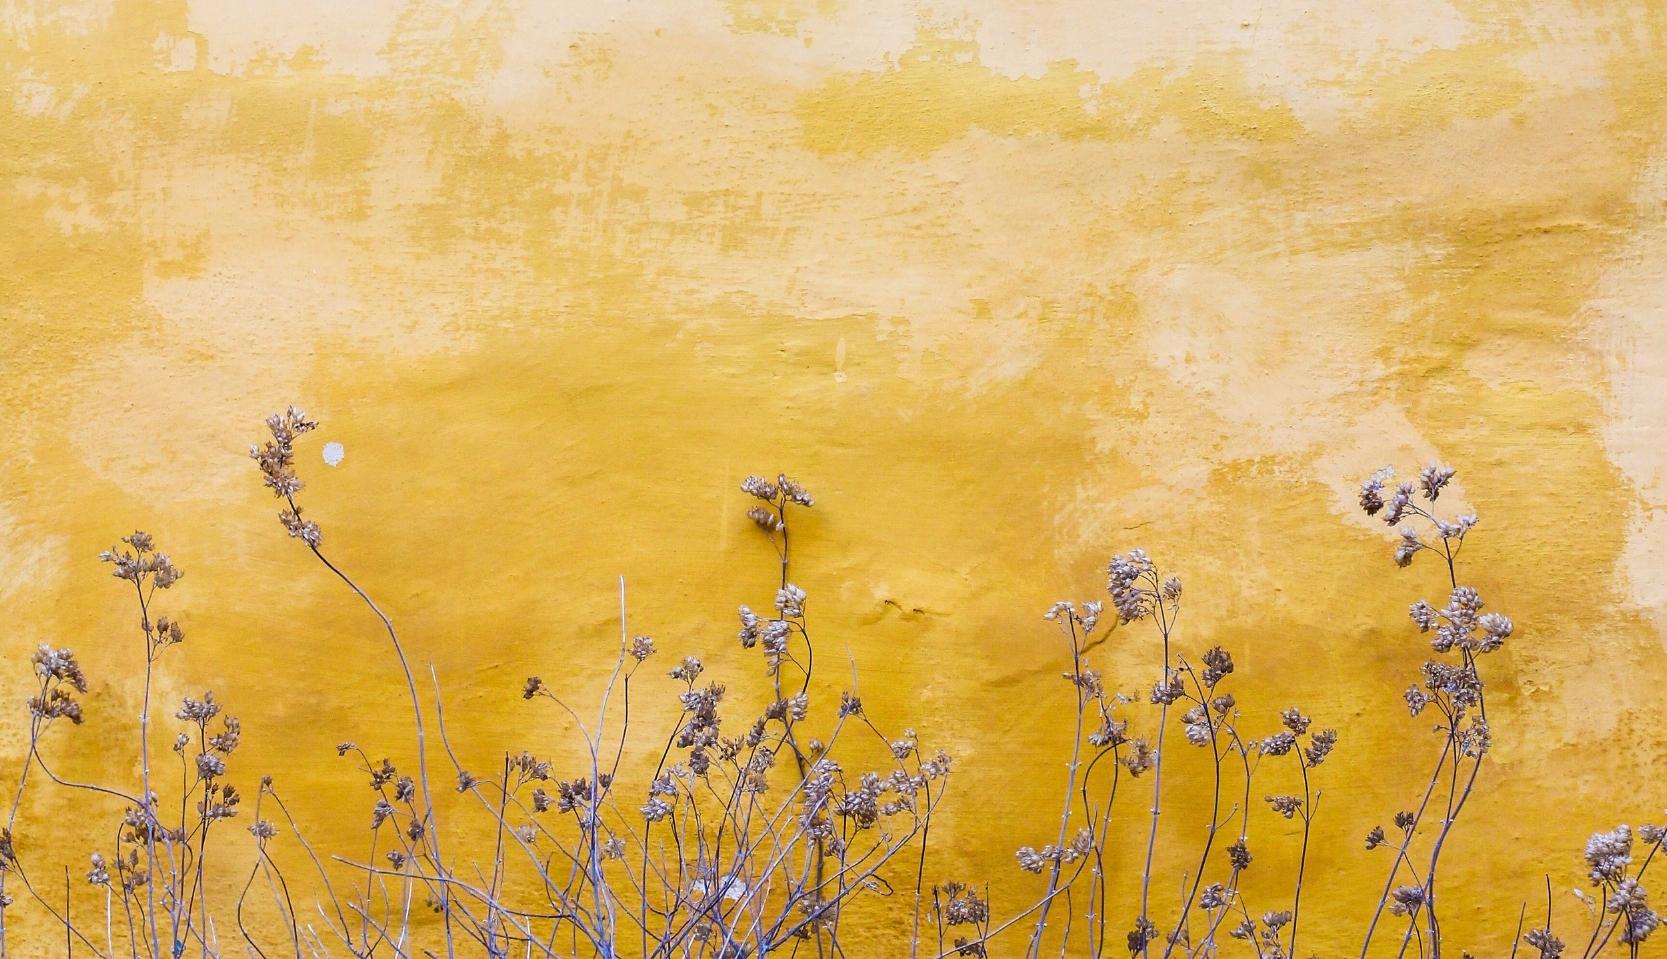 Image by Mona Kendra on Unsplash